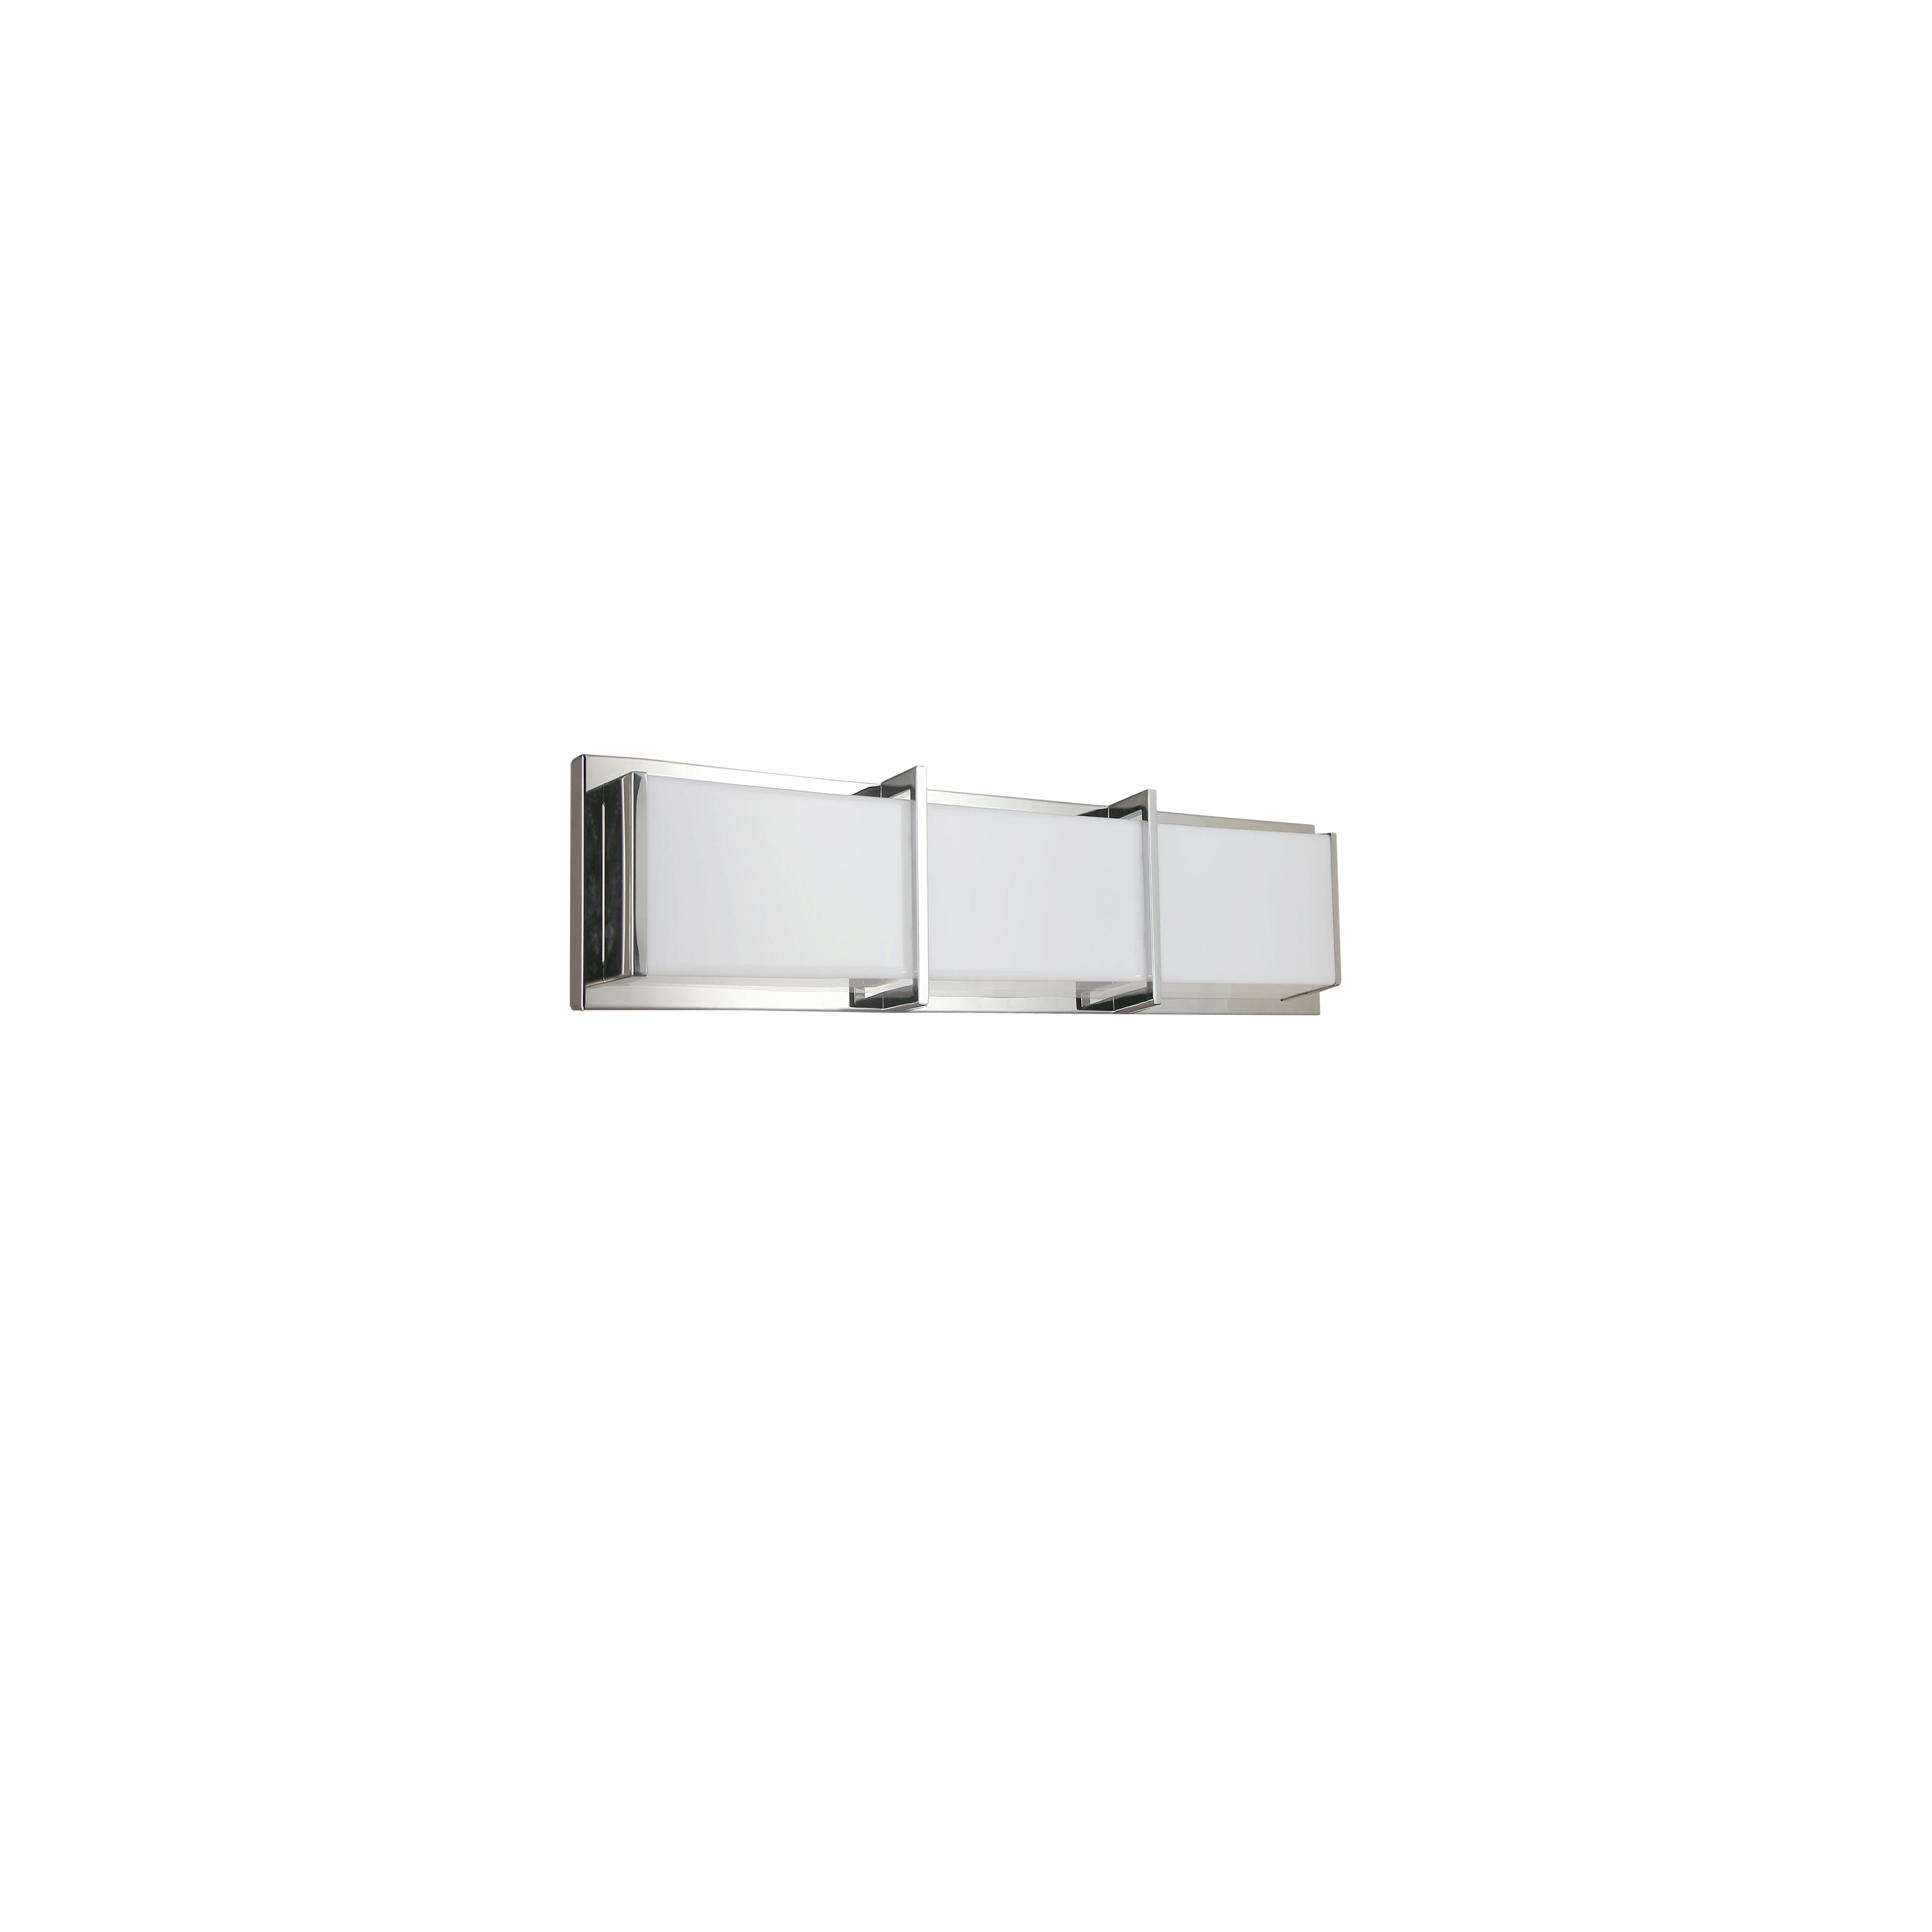 15W Polished Chrome Vanity Light w/ White Acrylic Diffuser